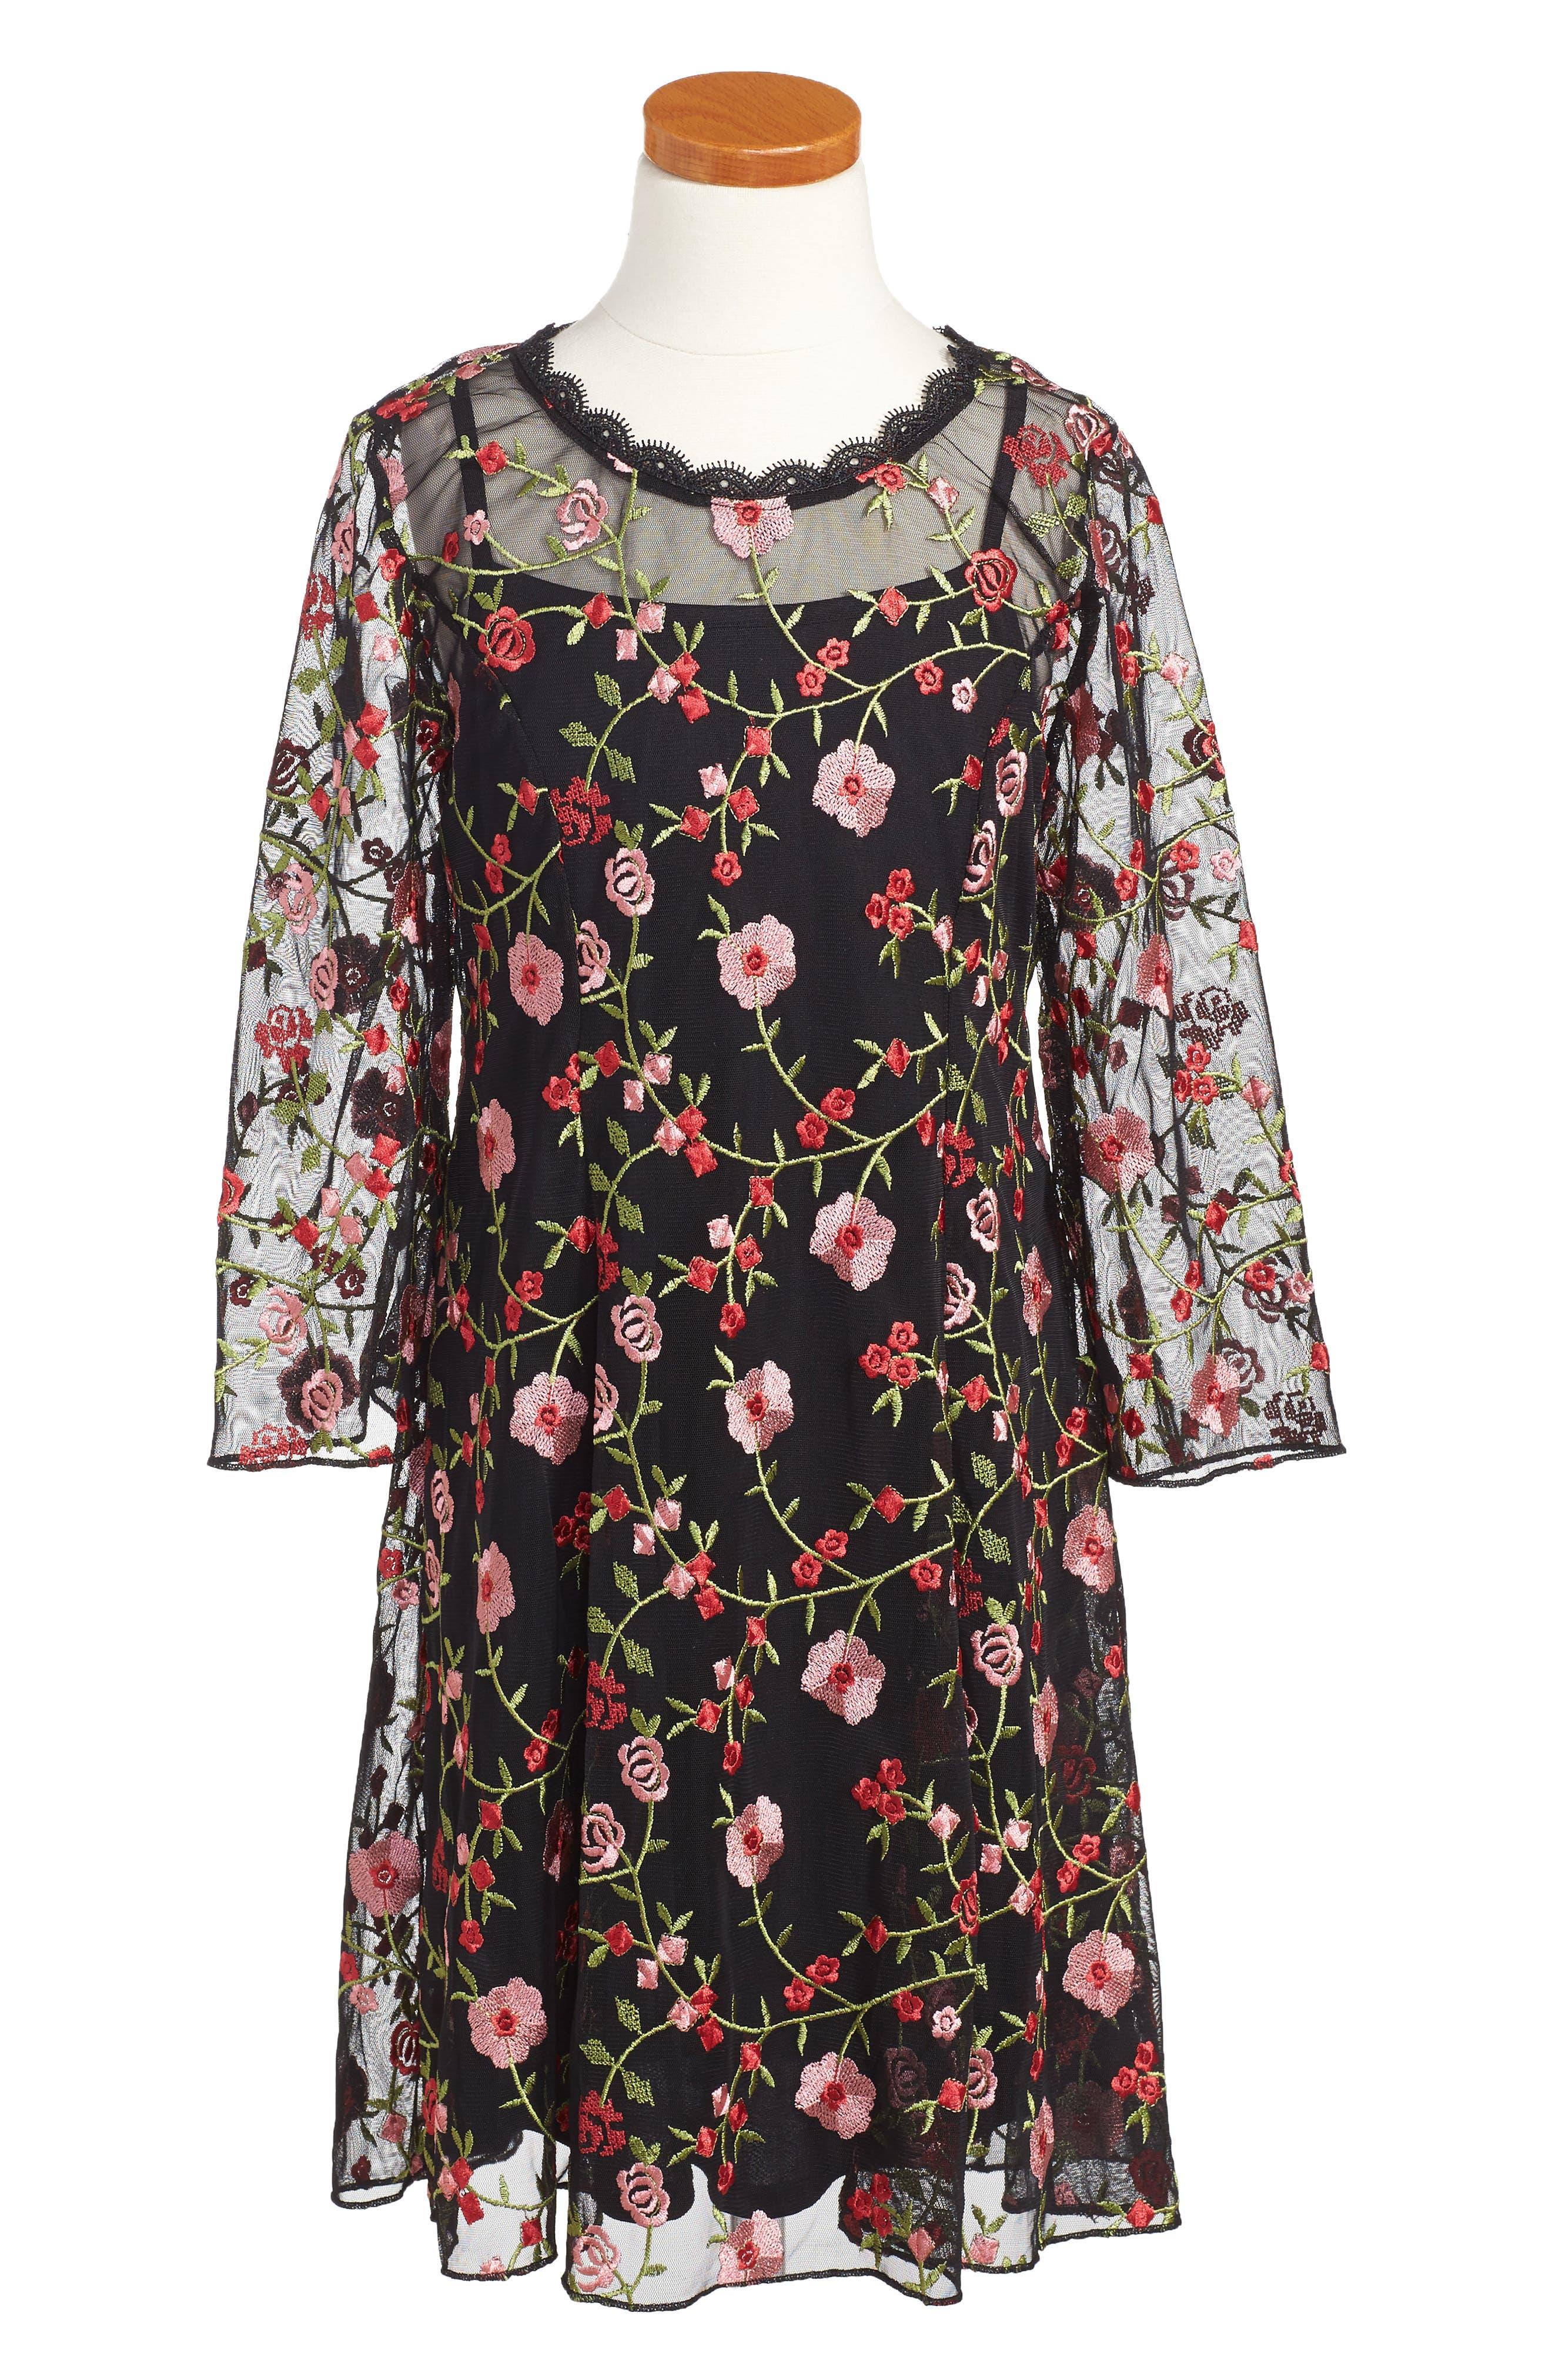 Floral Embroidered Shift Dress,                         Main,                         color, Black/ Red